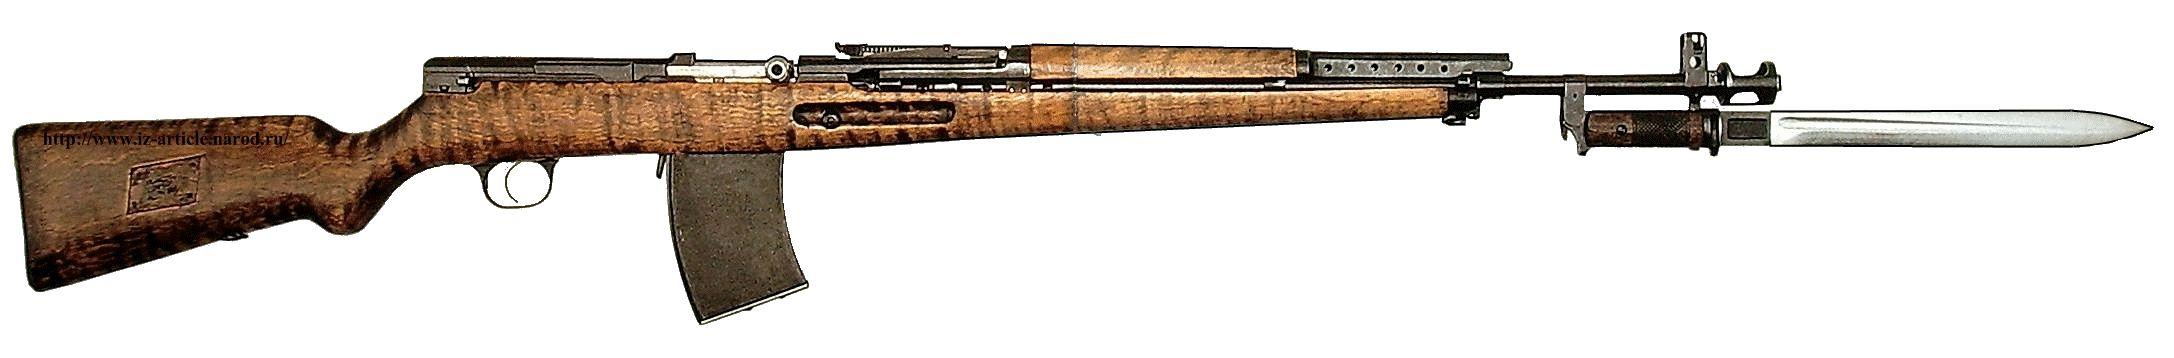 АВС-36. Винтовка  Симонова. Оружие Ижевска.